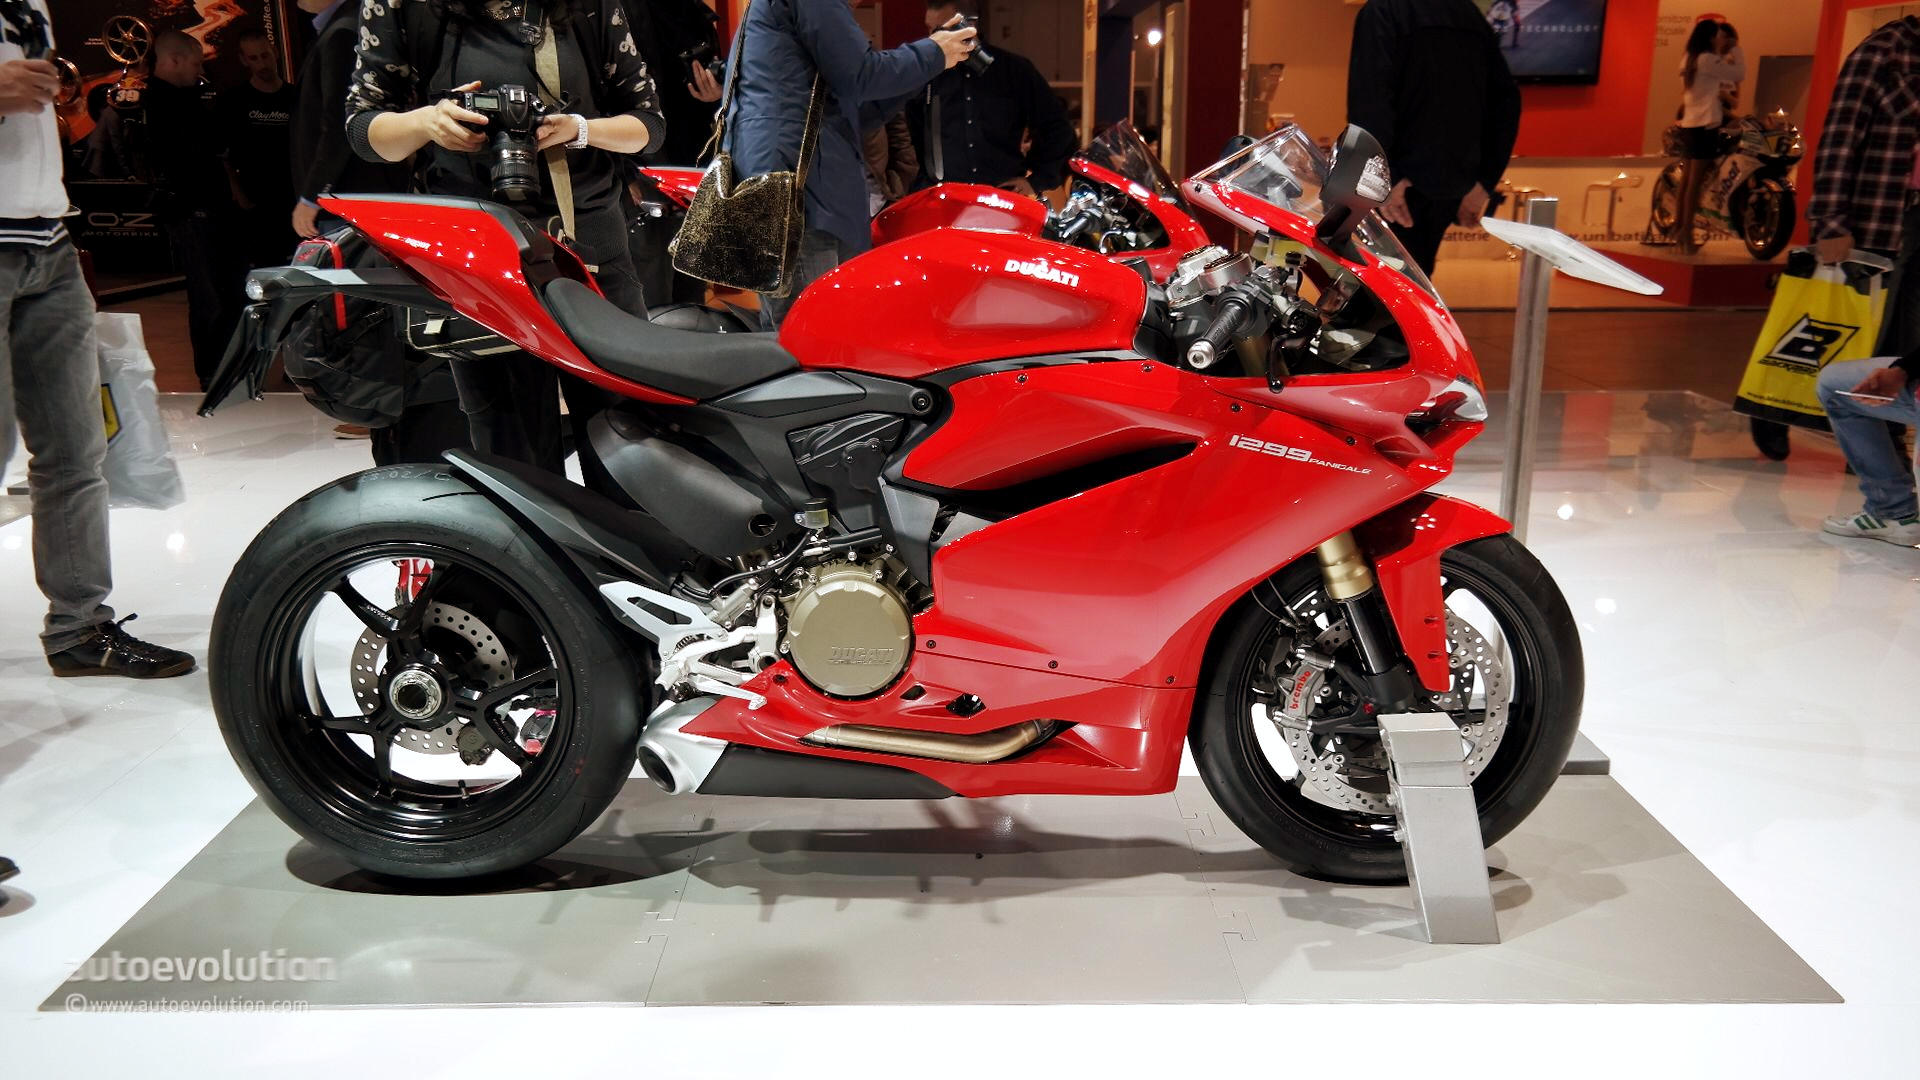 Ducati Panigale 1200cc >> 2015 Ducati 1299 Panigale S Unveiled: the Silicon Superbike [Live Photos] - autoevolution